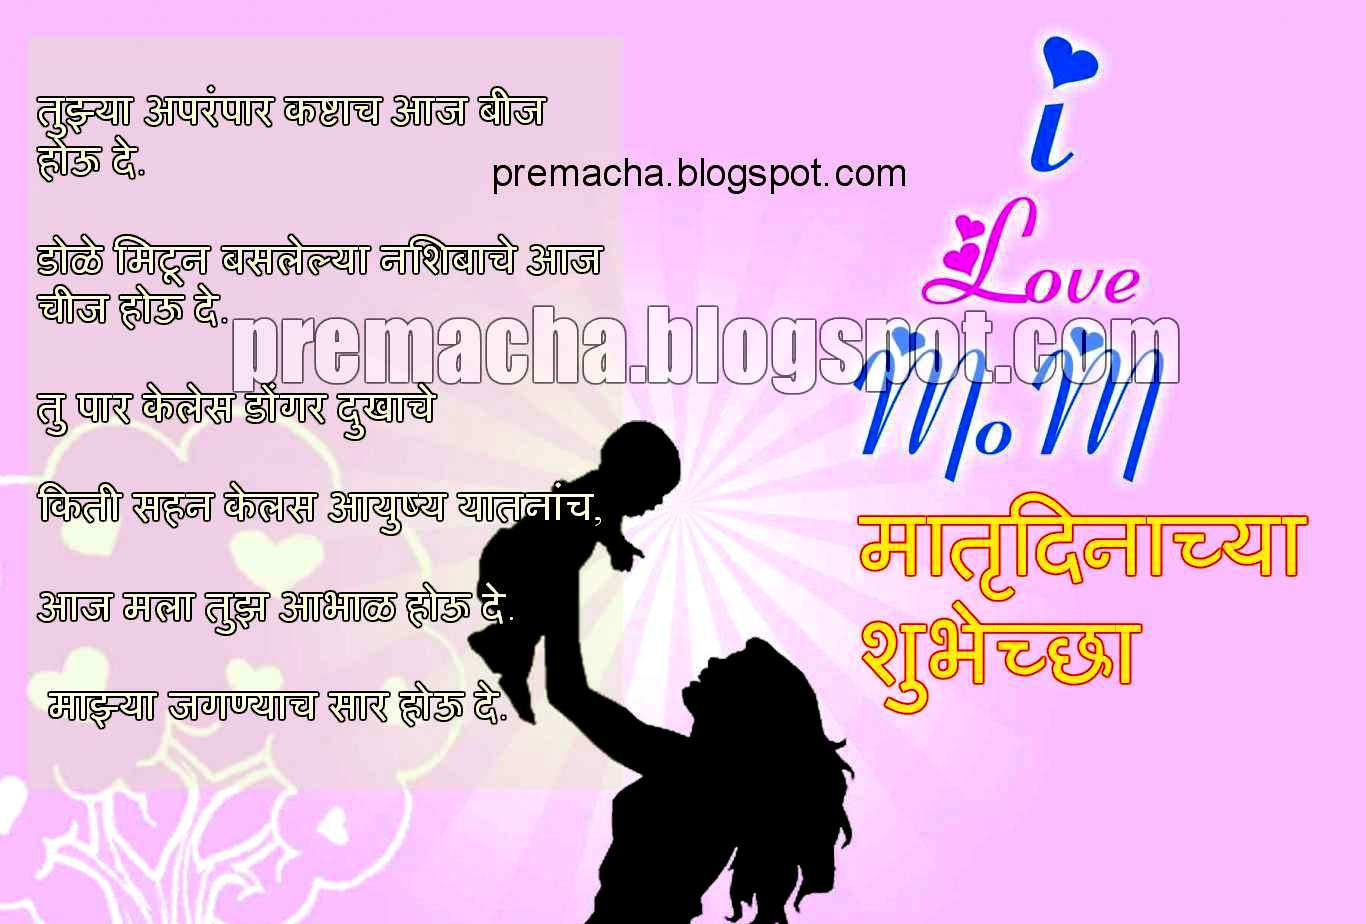 Wallpaper of love poems in marathi pc wallpaper of love poems in marathi kavita love message sms prem quotes thoughts altavistaventures Images